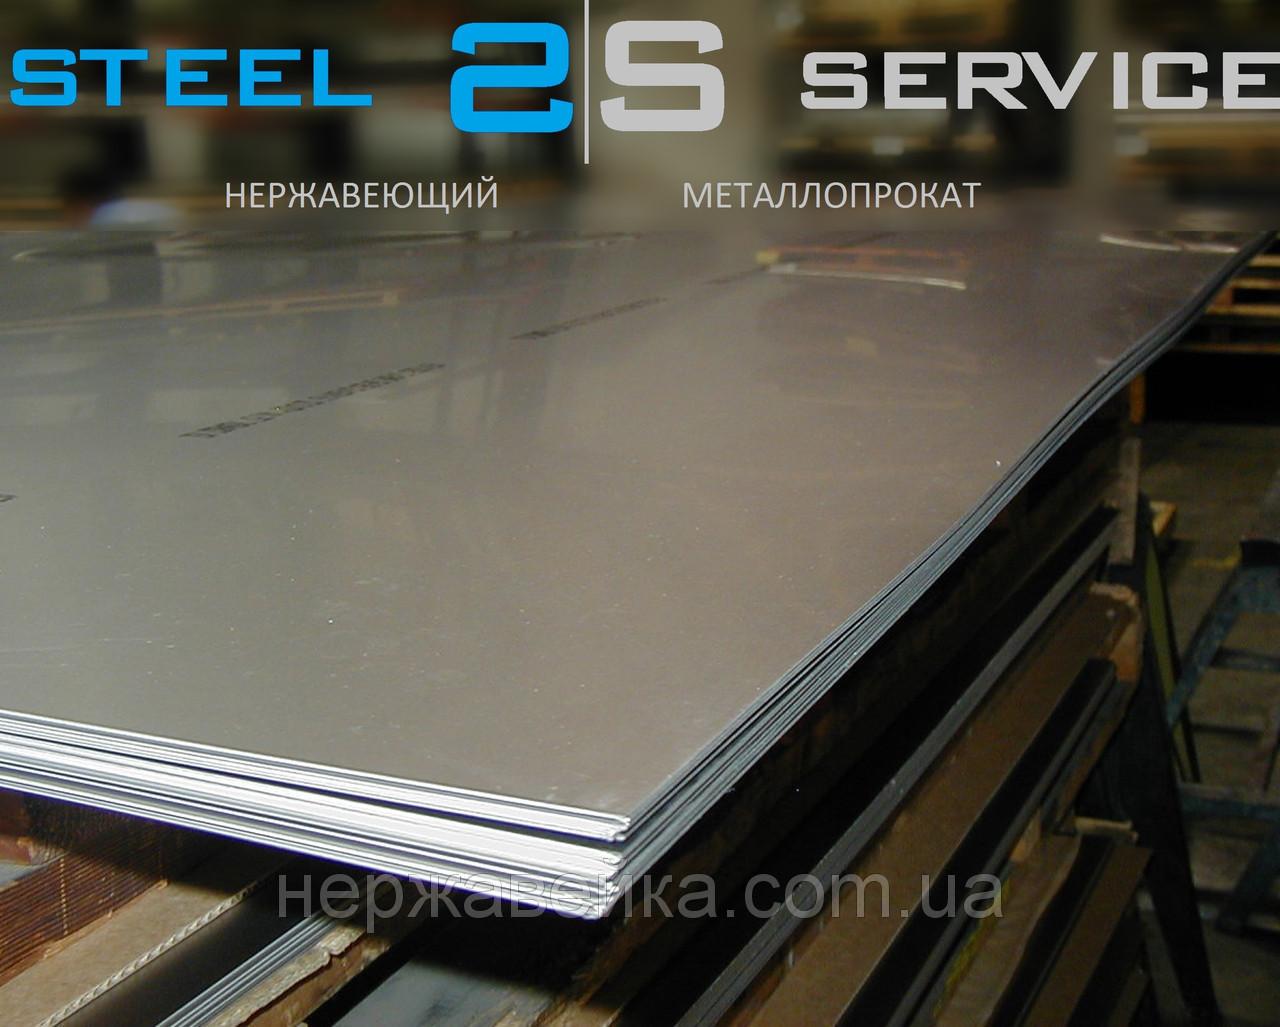 Нержавеющий лист 10х1250х2500мм  AISI 316L(03Х17Н14М3) F1 - горячекатанный,  кислотостойкий